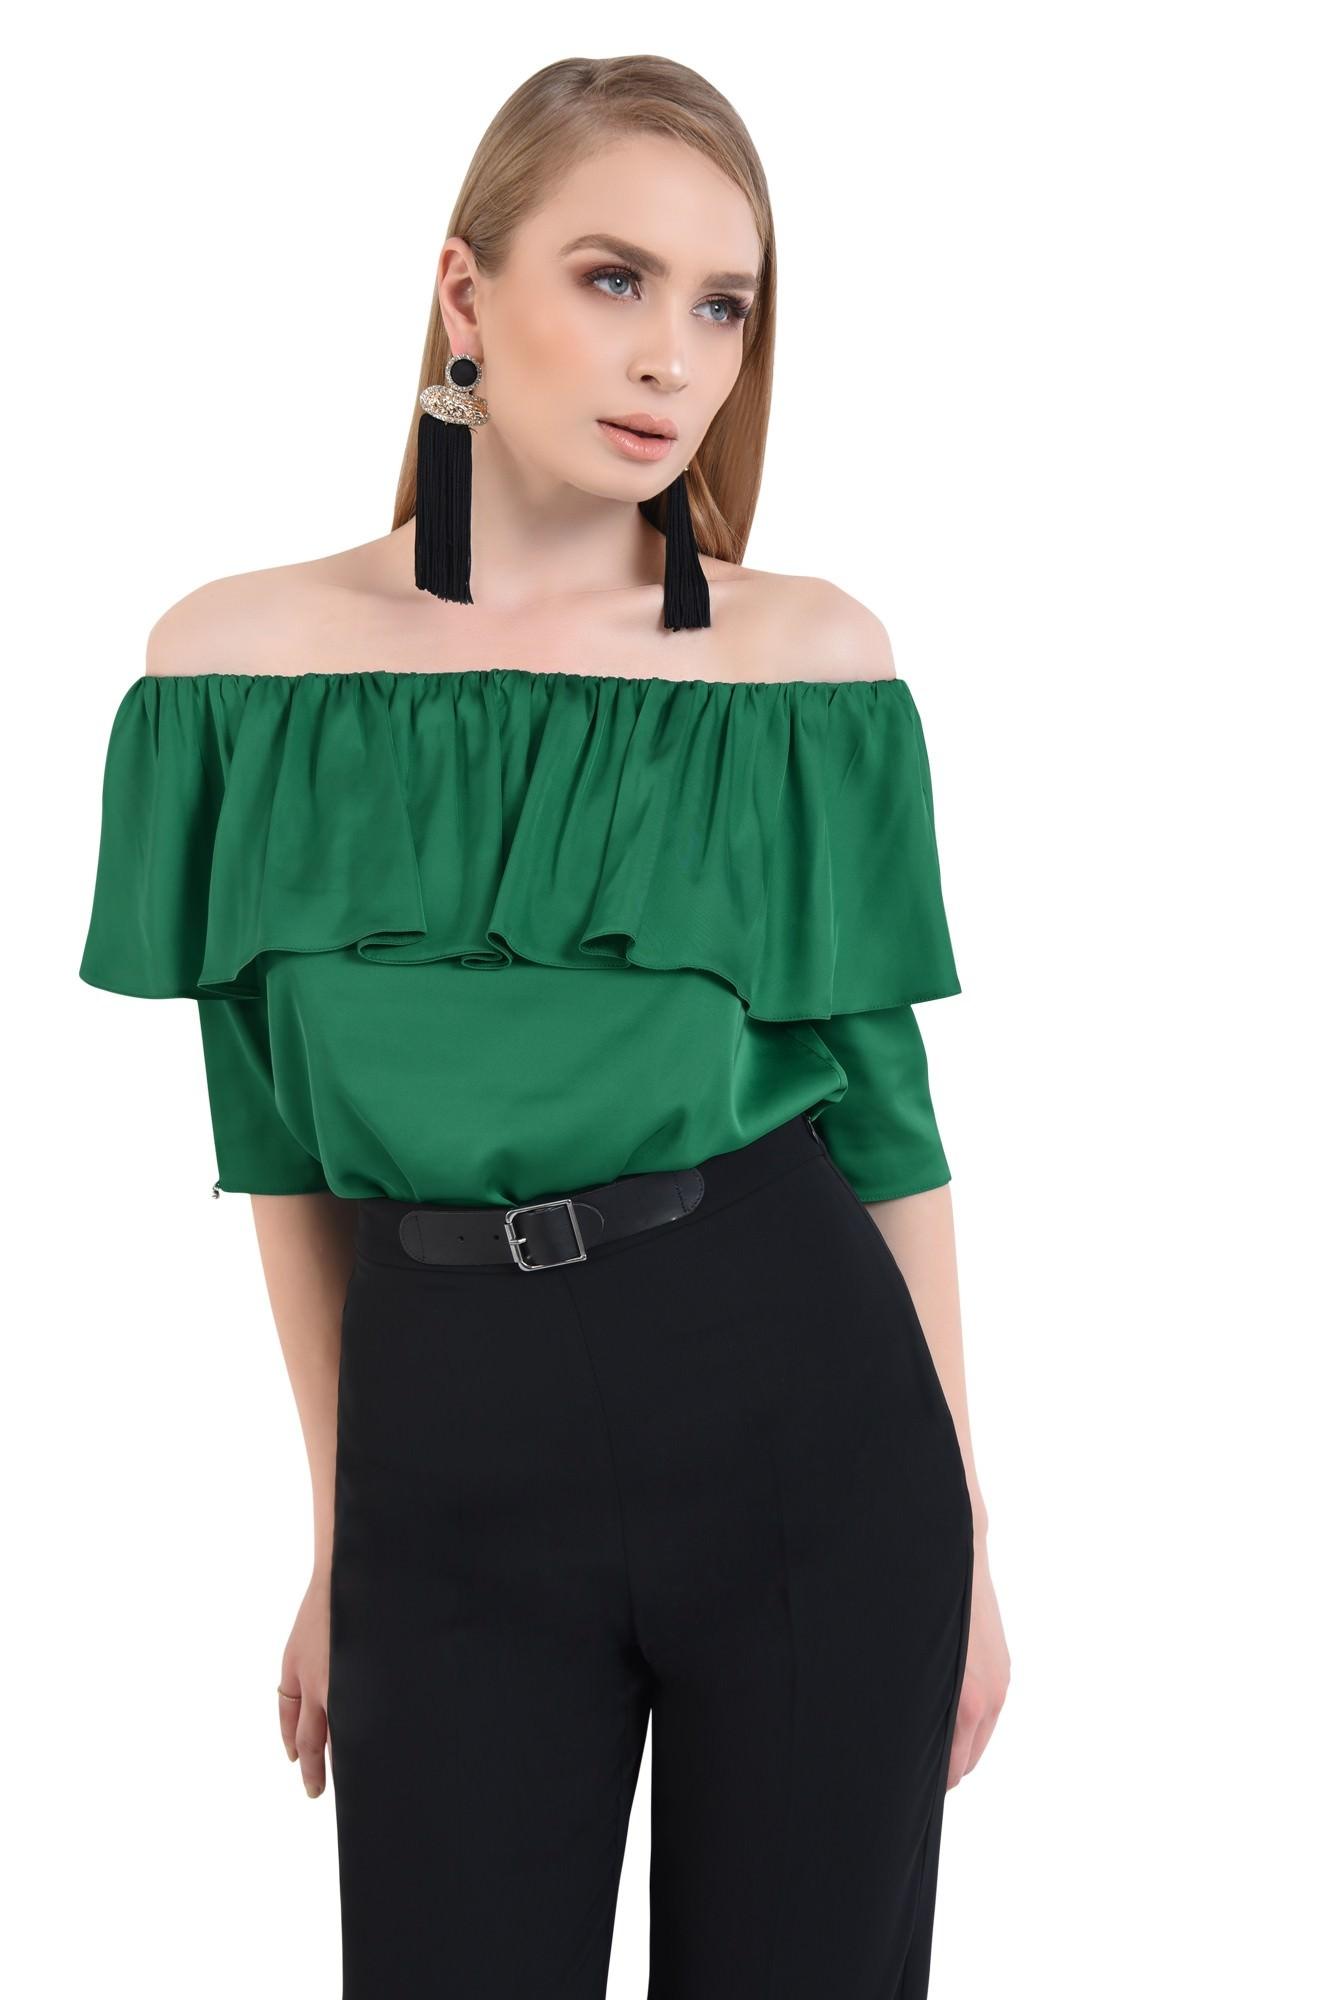 0 - Bluza eleganta, din sifon, tesatura, elastic